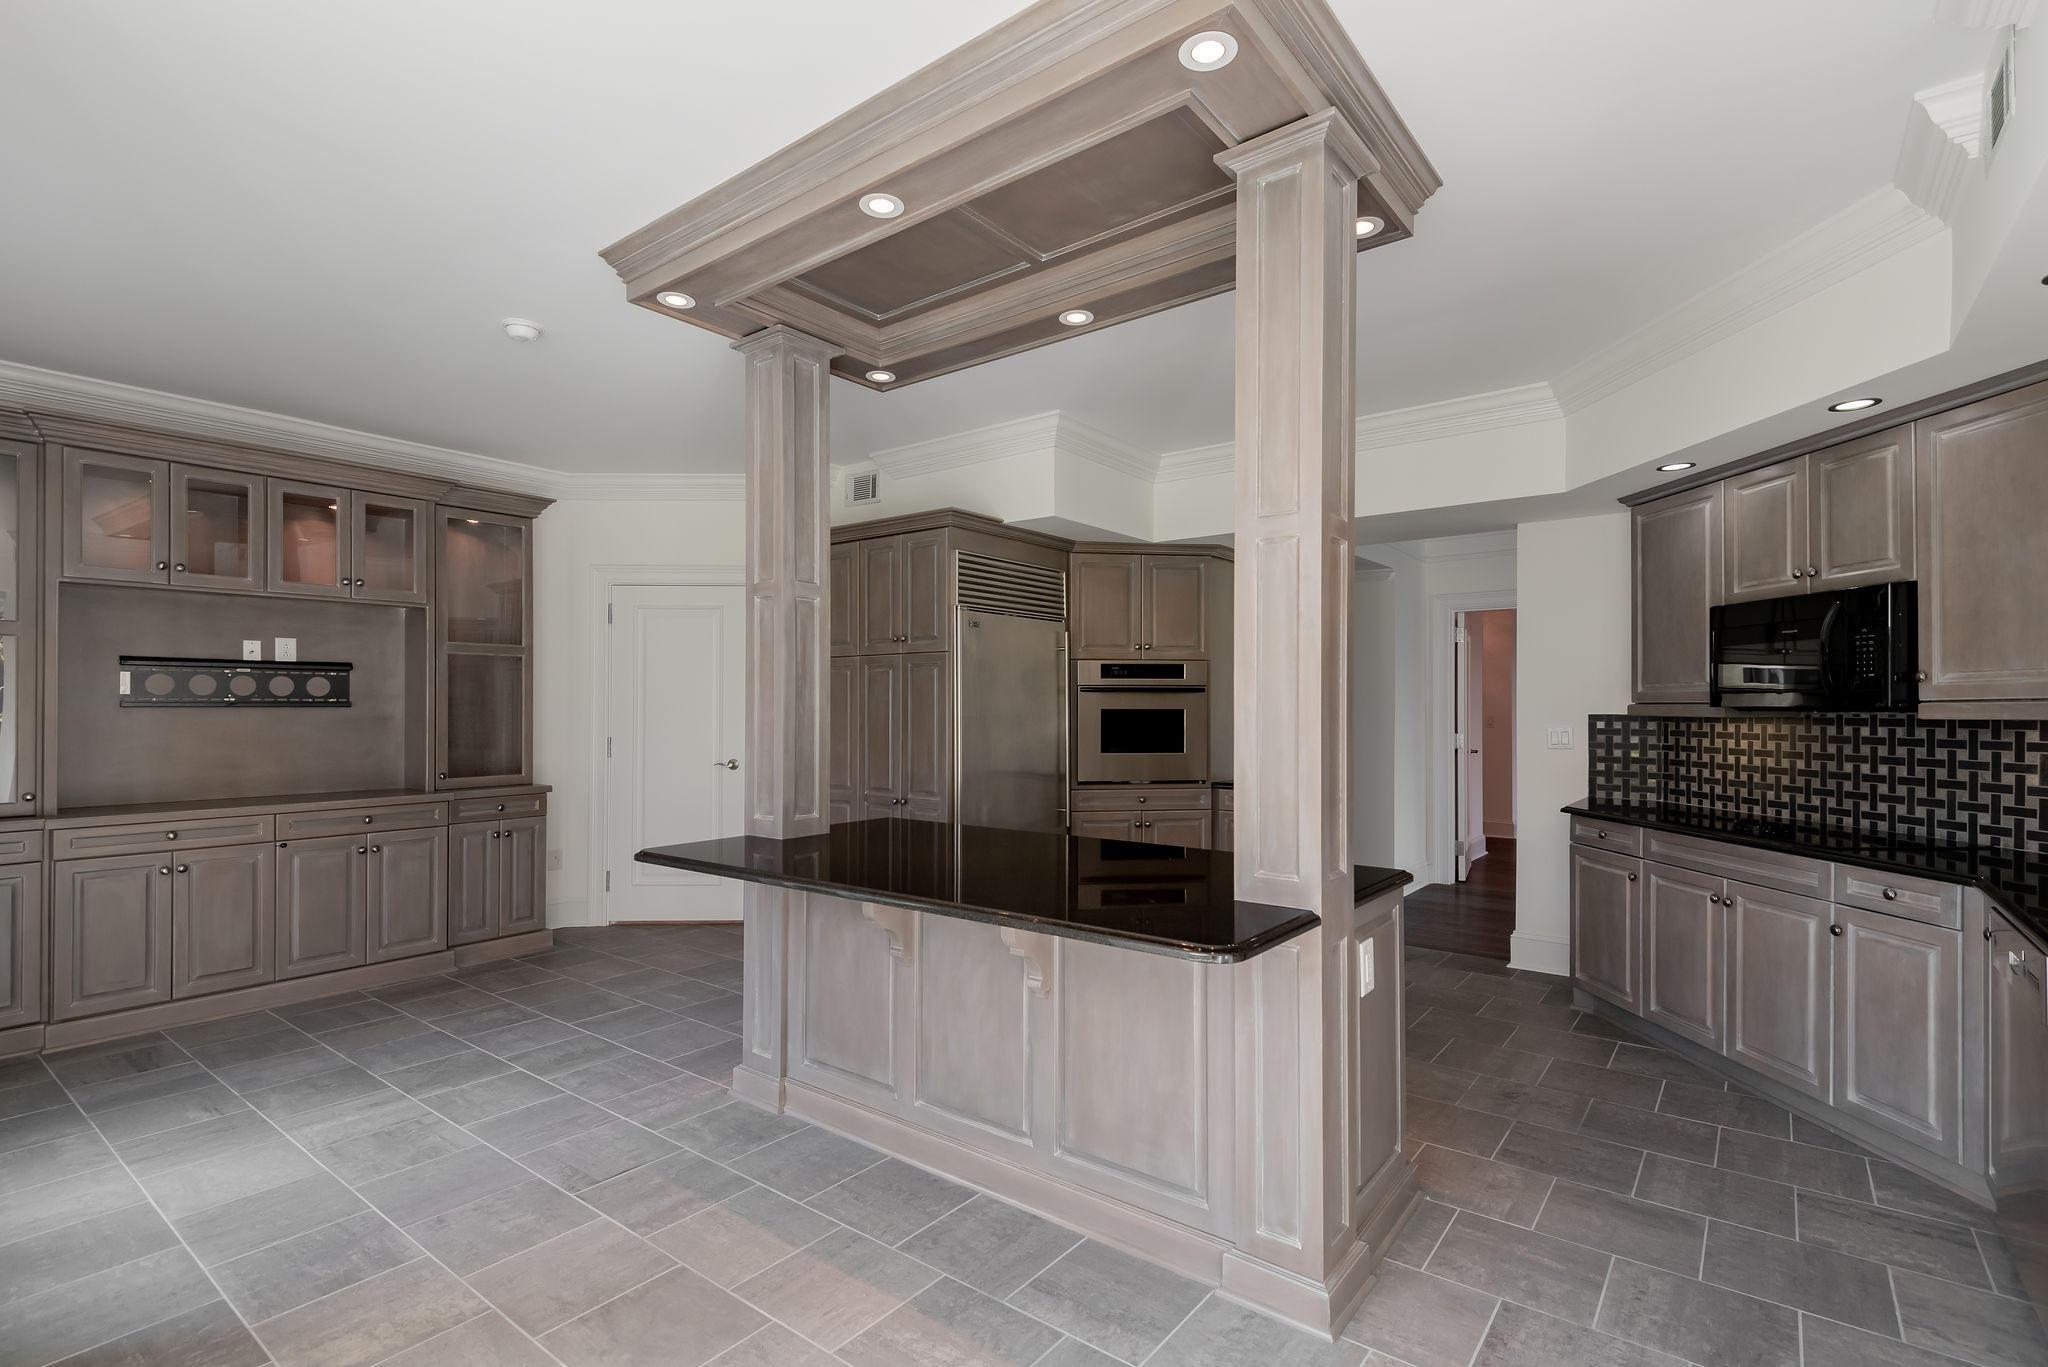 Renaissance On Chas Harbor Homes For Sale - 211 Plaza, Mount Pleasant, SC - 25